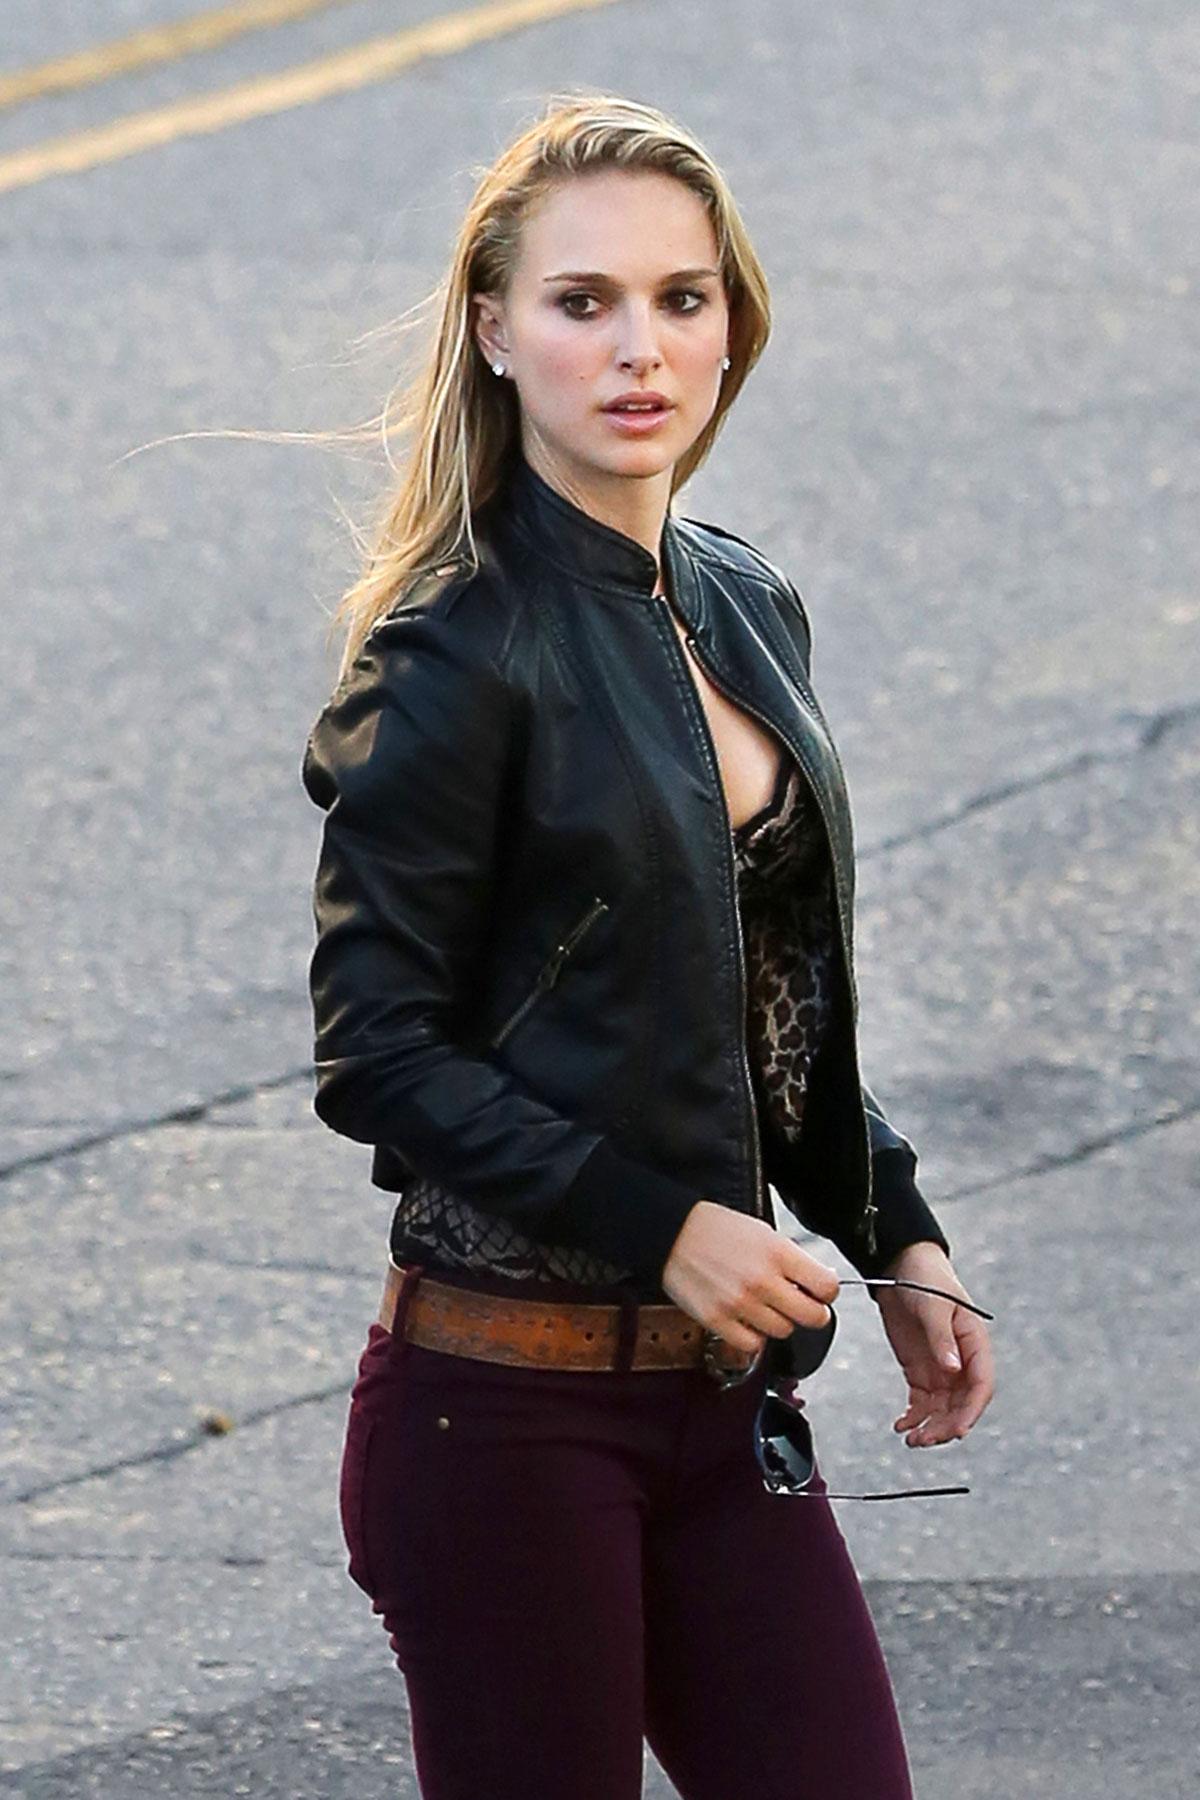 Natalie-Portman-Age-Height-Weight Actress Natalie Portman Biography Age Wiki Top Sizzling Bikini Images